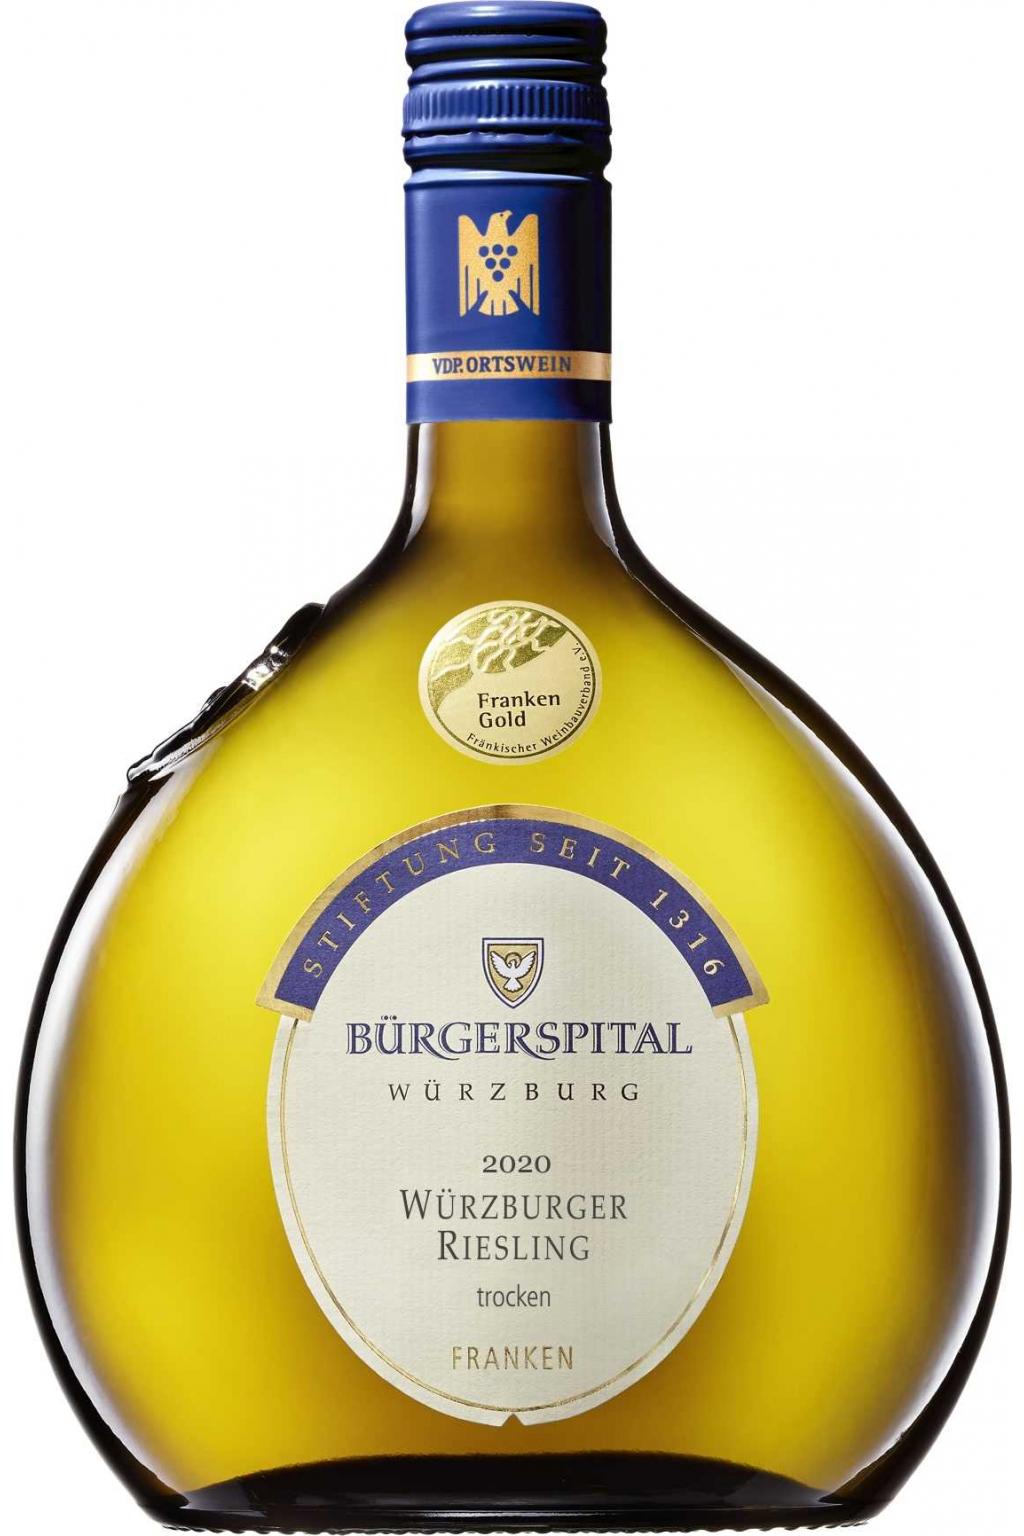 Wuerzburger Riesling Buergerspital